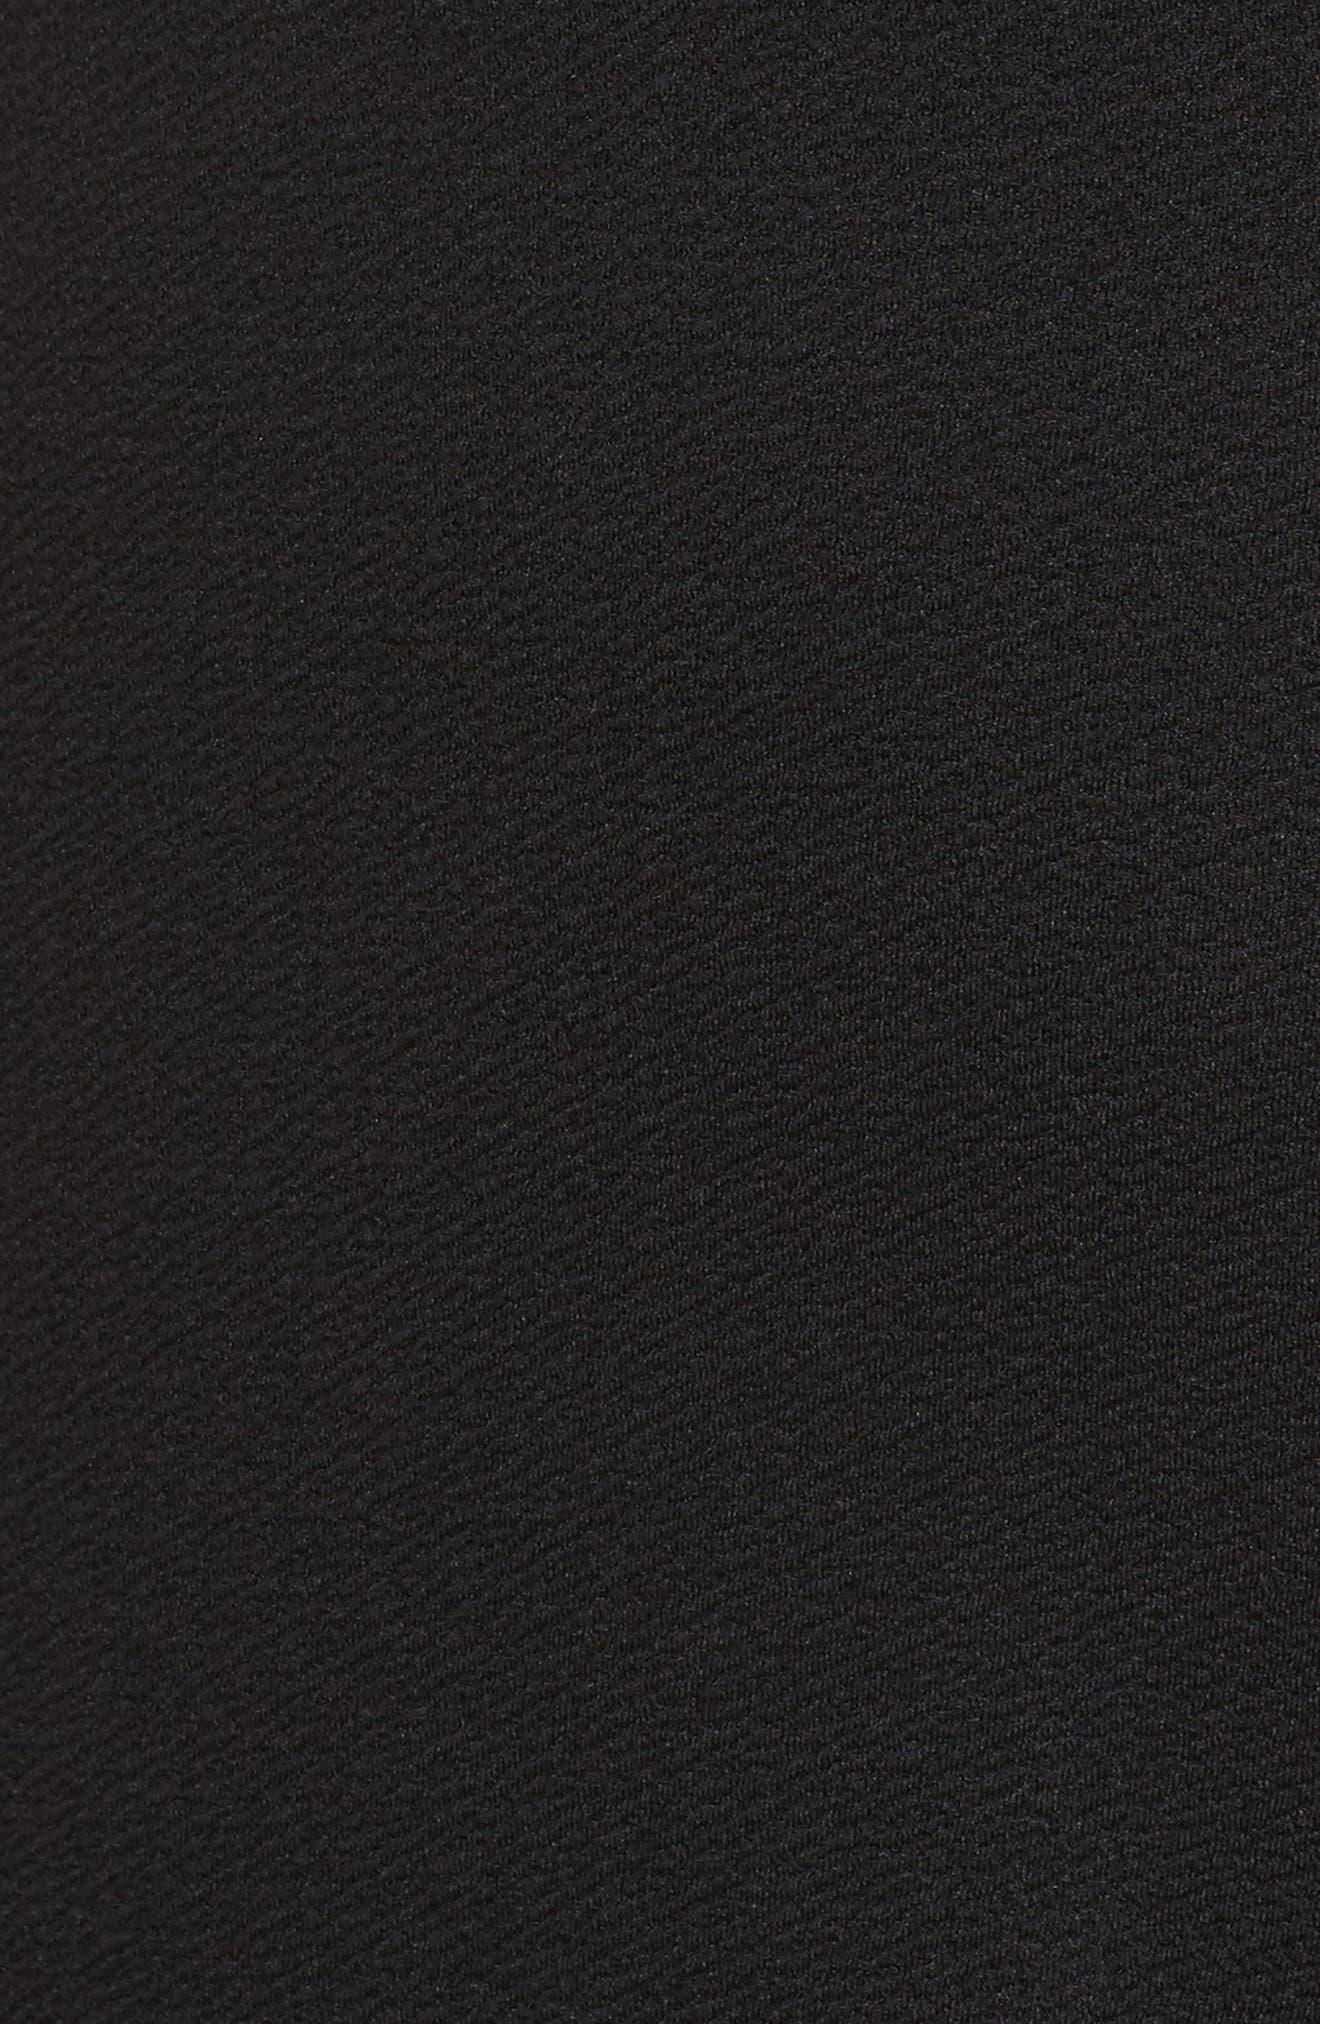 Ruffle Sleeve Romper,                             Alternate thumbnail 5, color,                             001